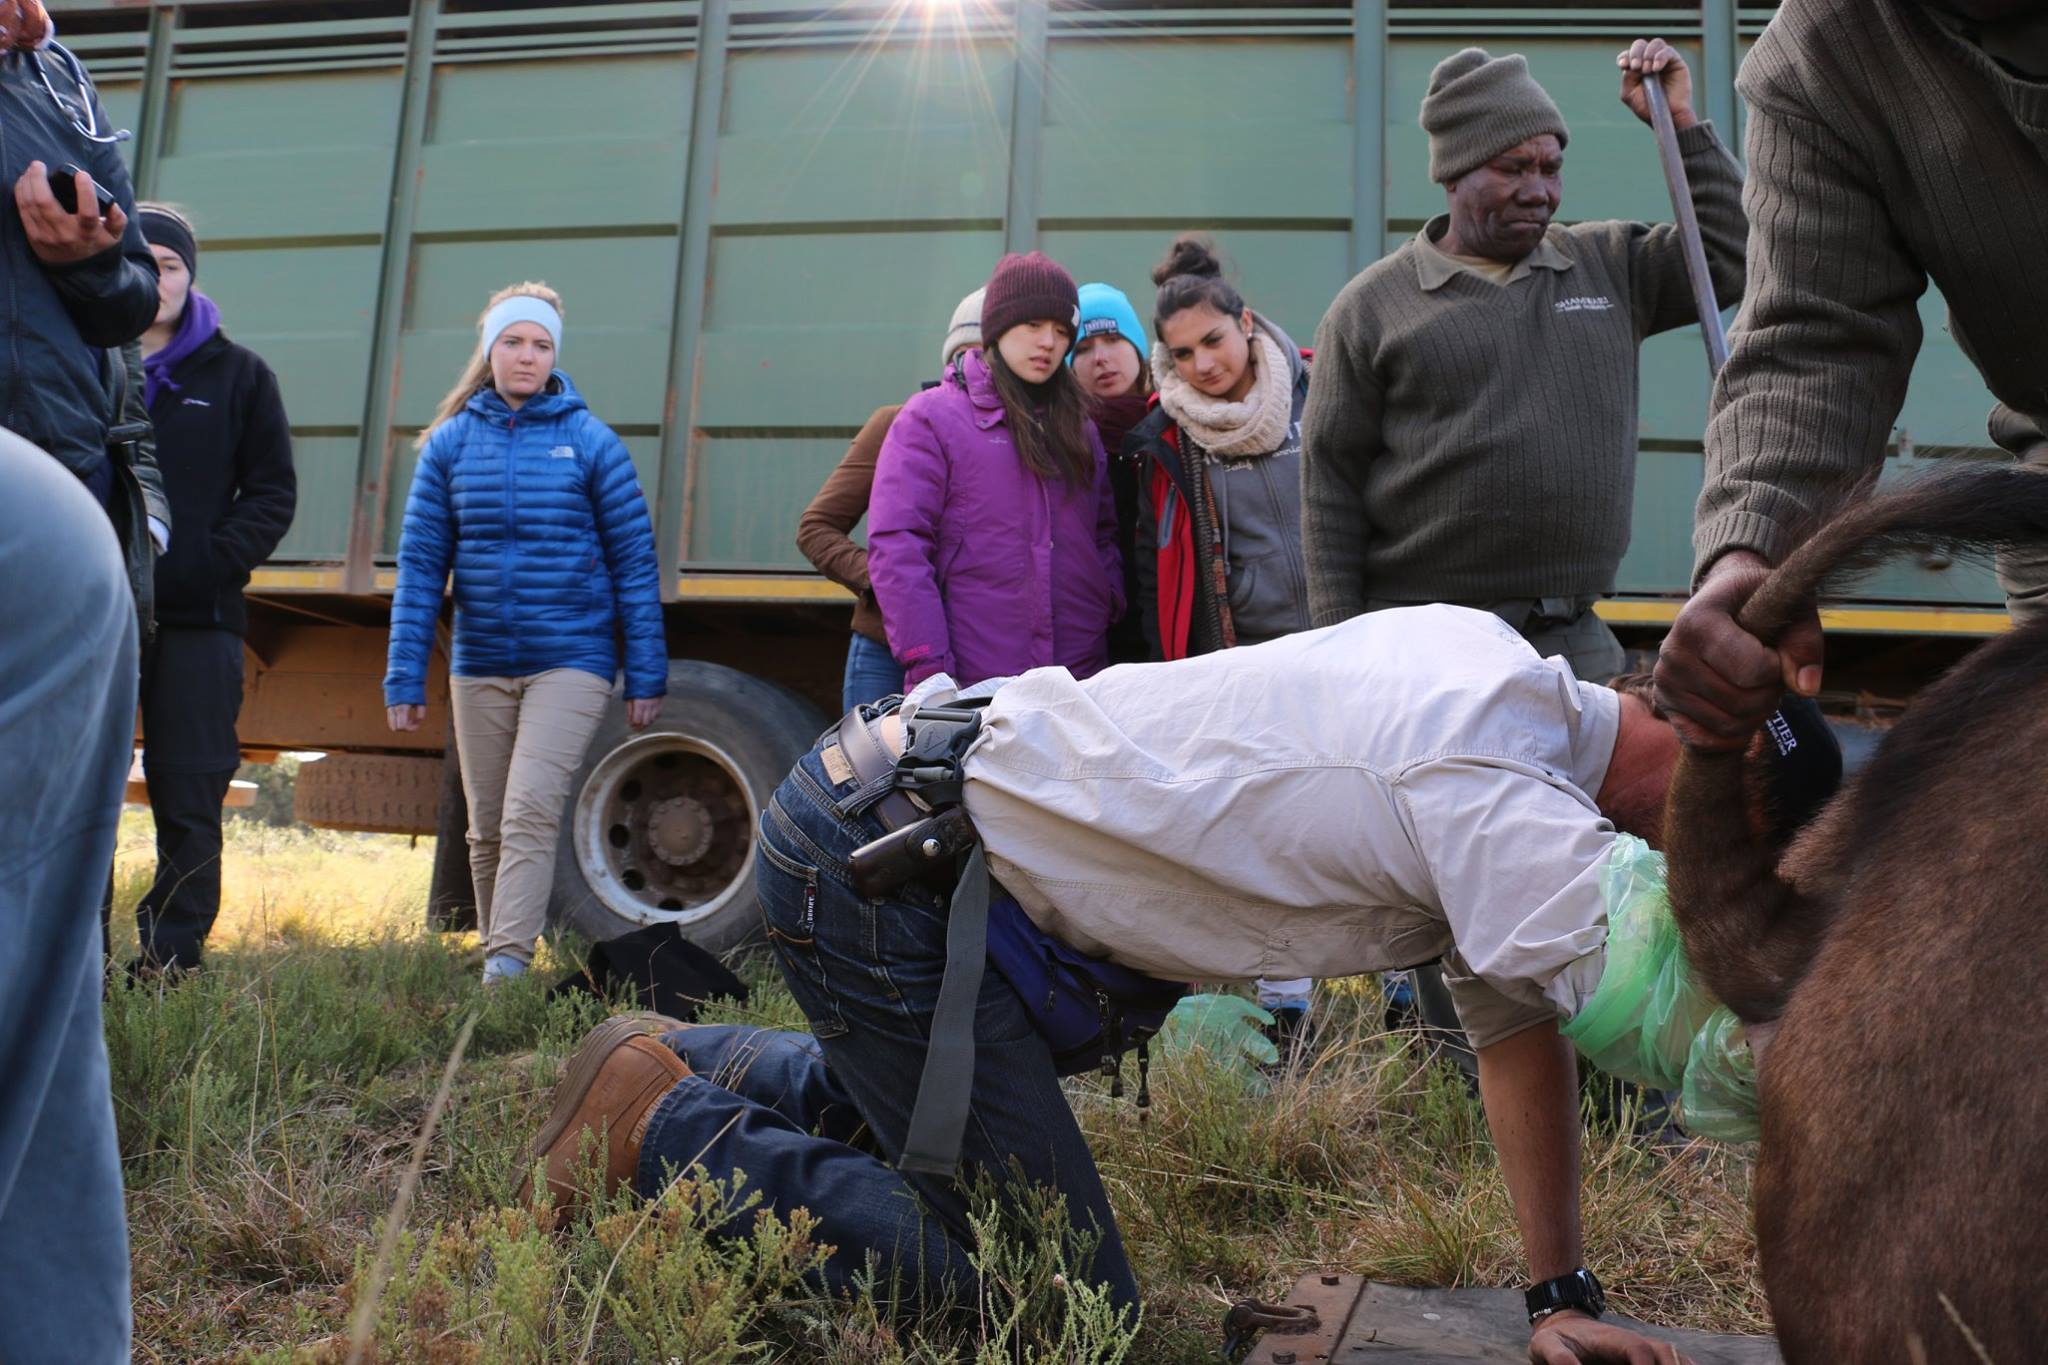 Volunteers watch on as a Shamwari vet treats an animal